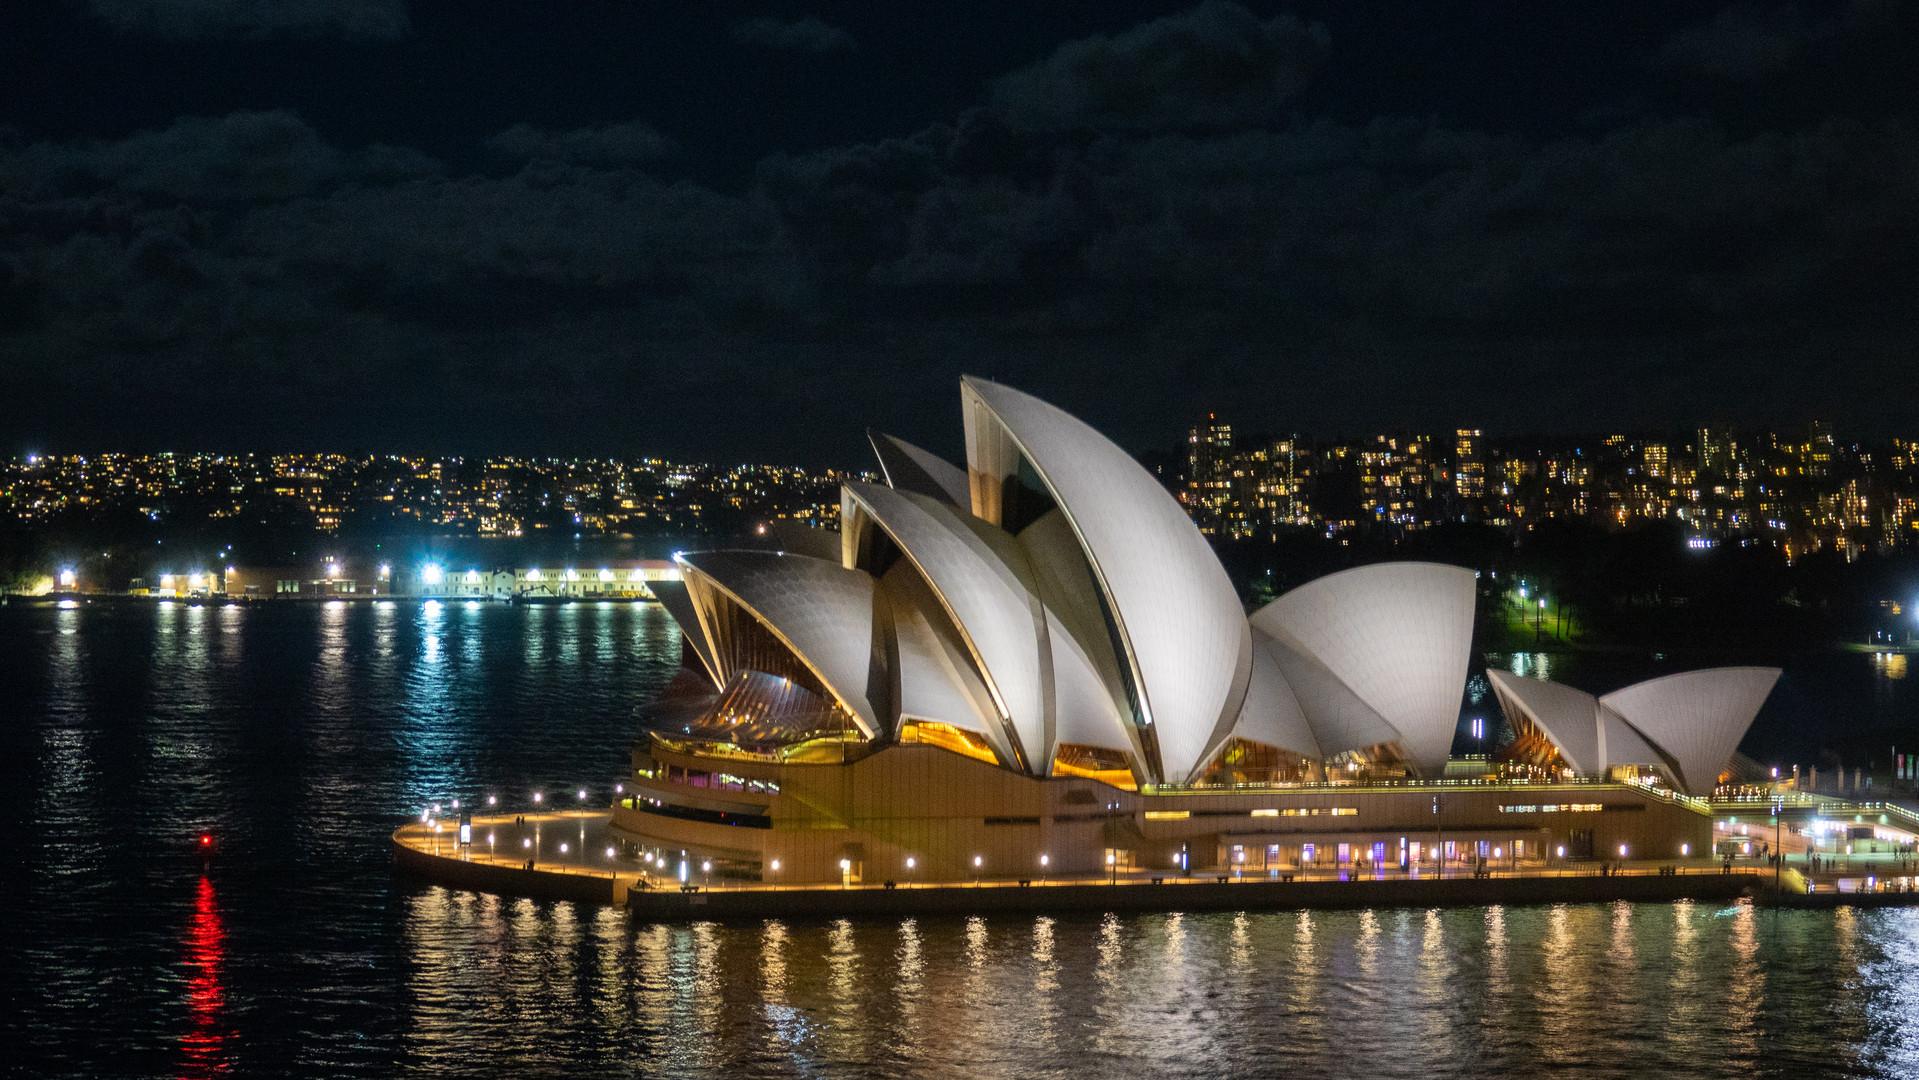 Night of the opera house